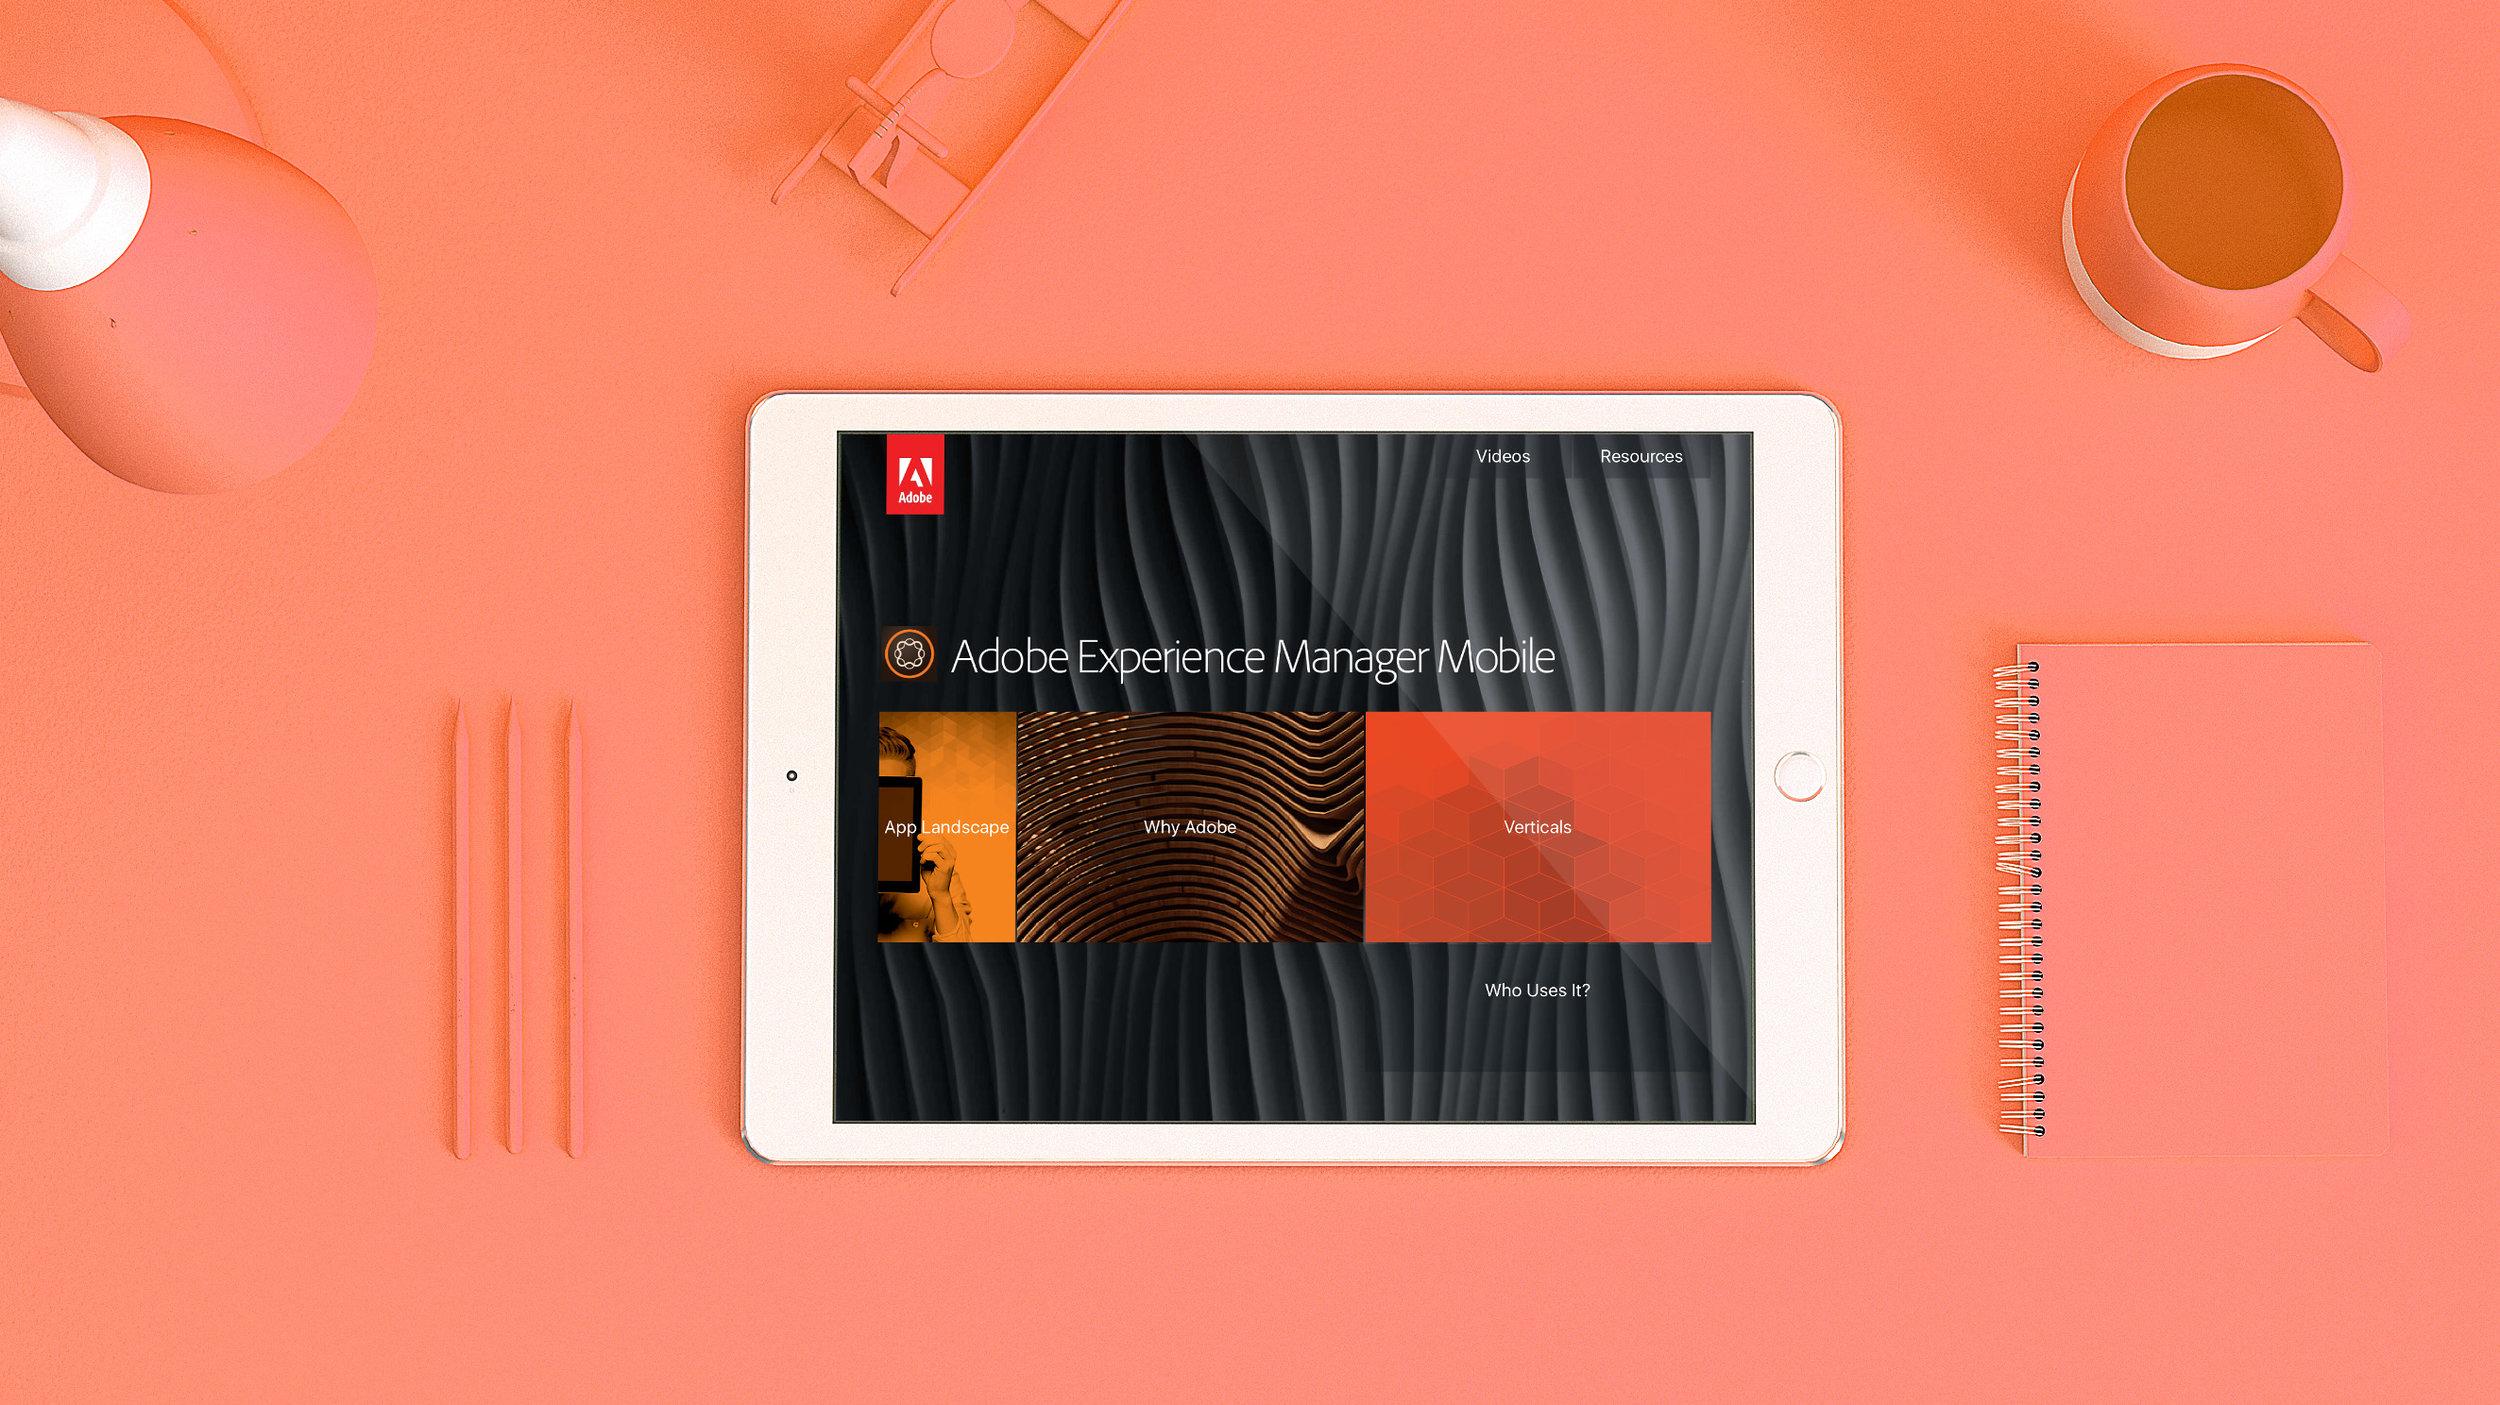 adobe aem mobile sales tool gridshift sean bates design ux